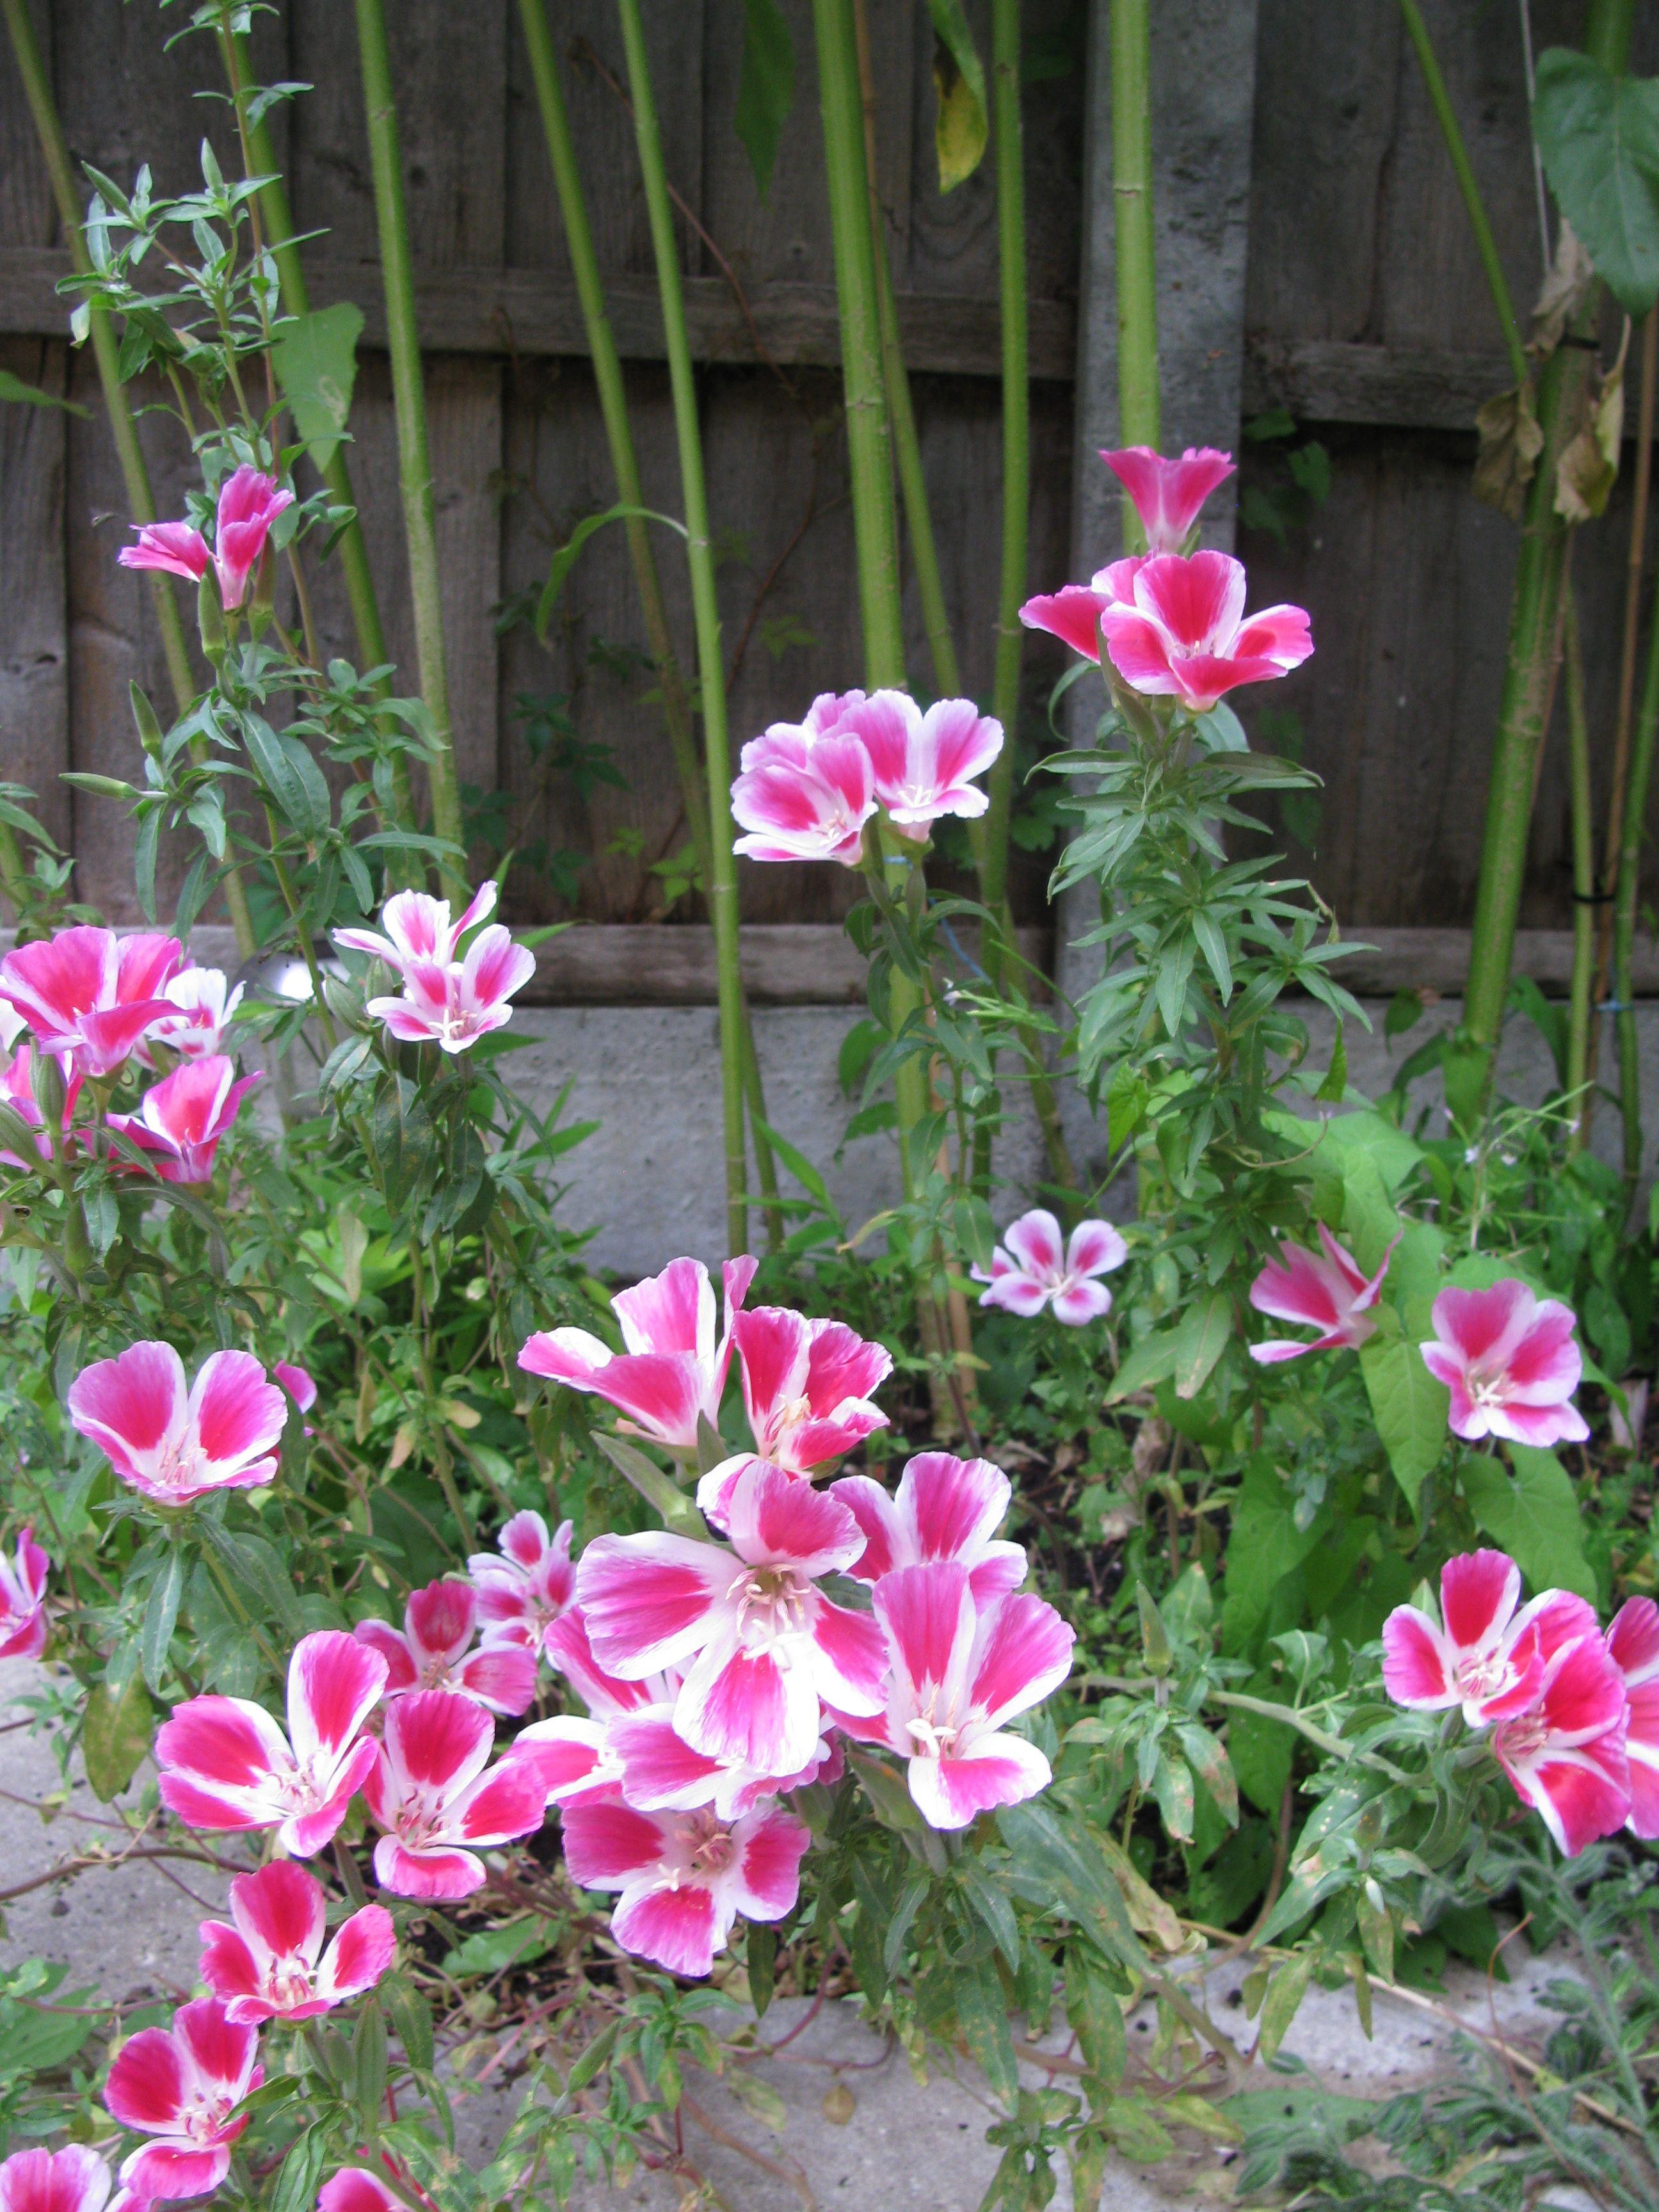 Dwarf Godetia Flowers Wild Flowers Perennials